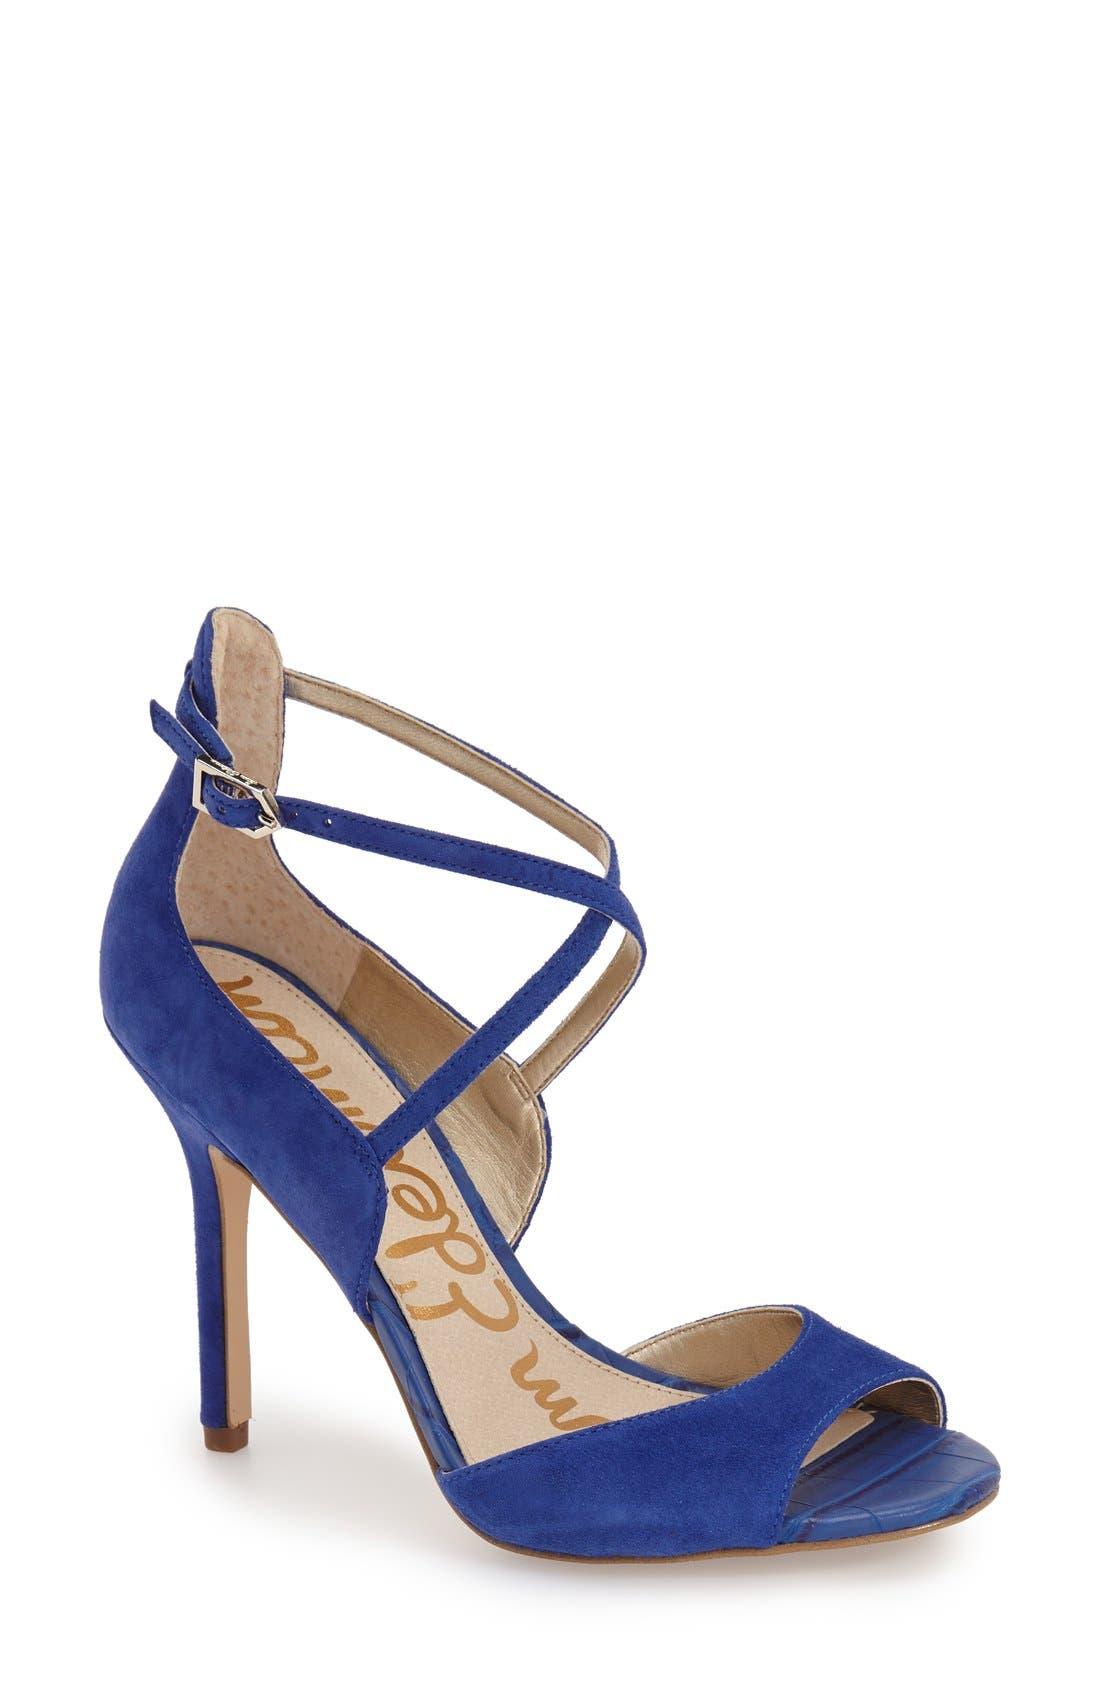 Main Image - Sam Edelman 'Audrey' Sandal (Women)